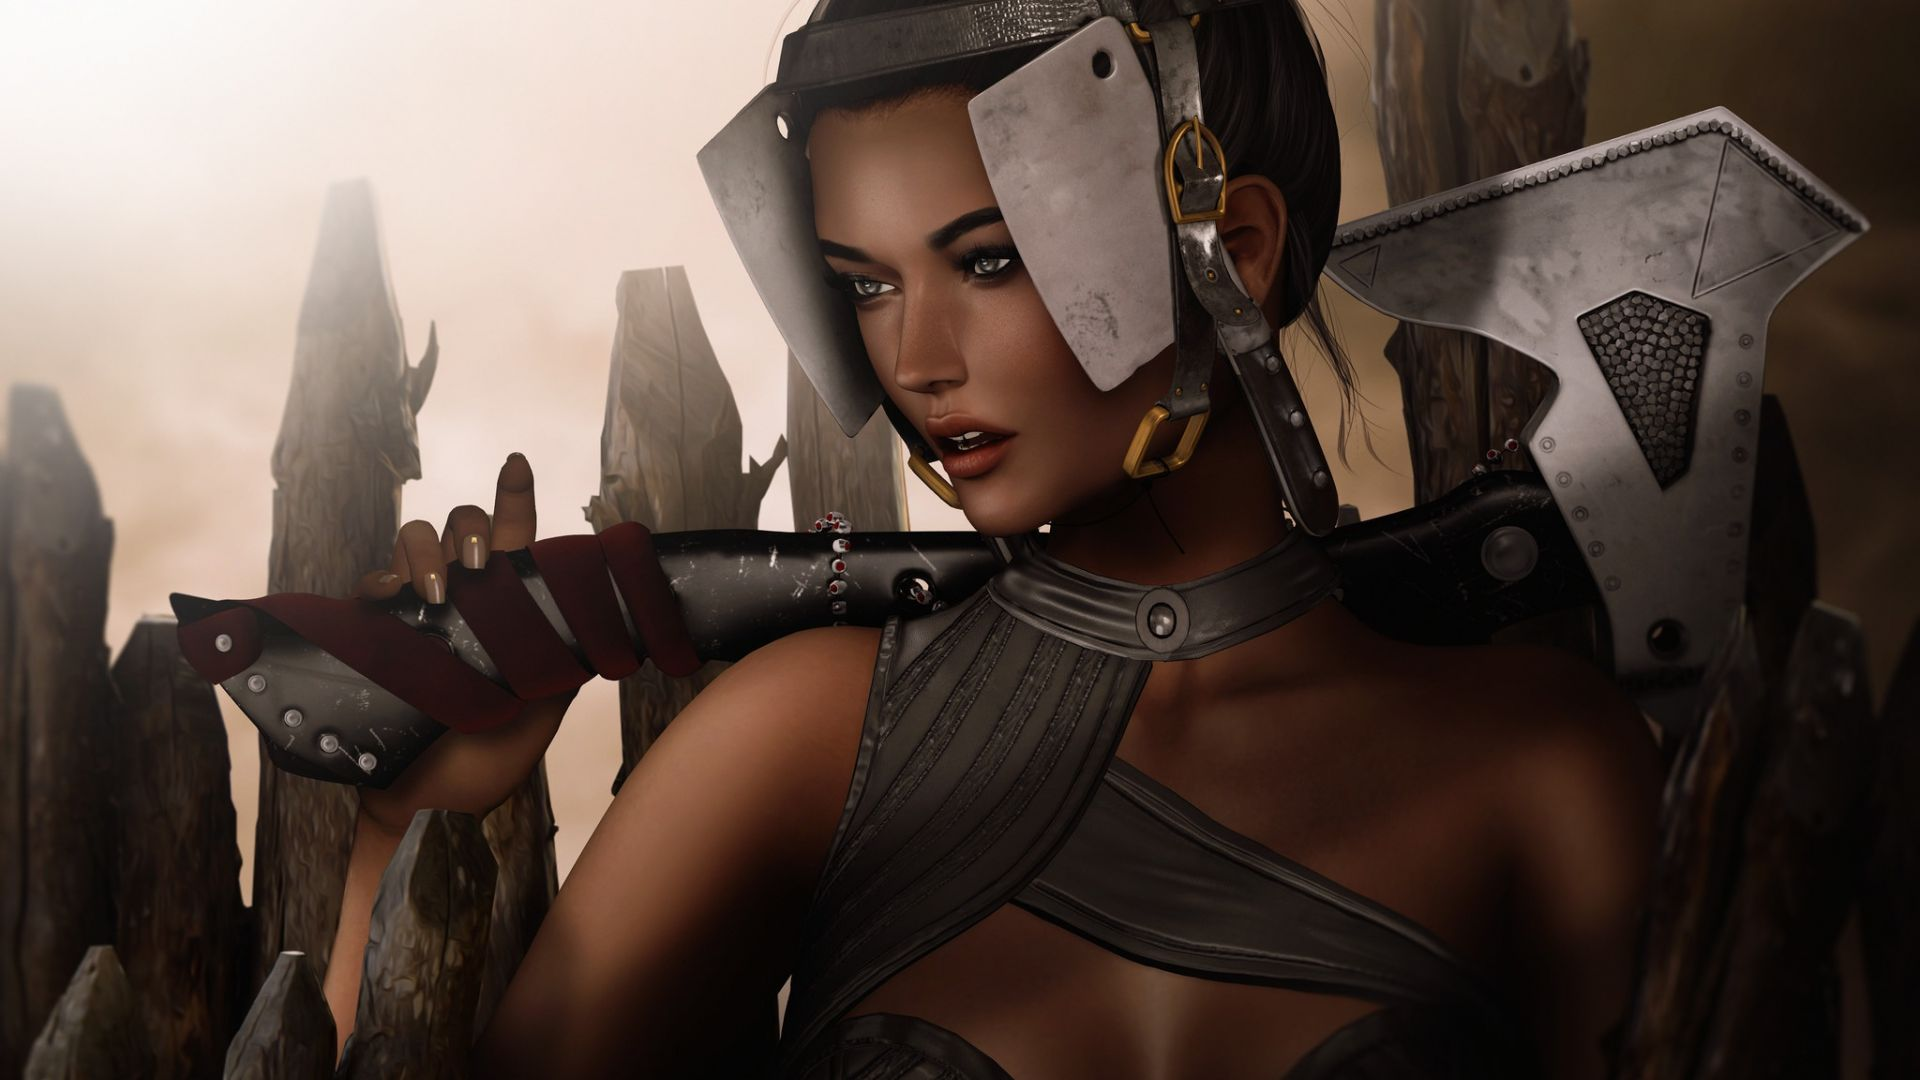 Wallpaper Fantasy girl, warrior, artwork